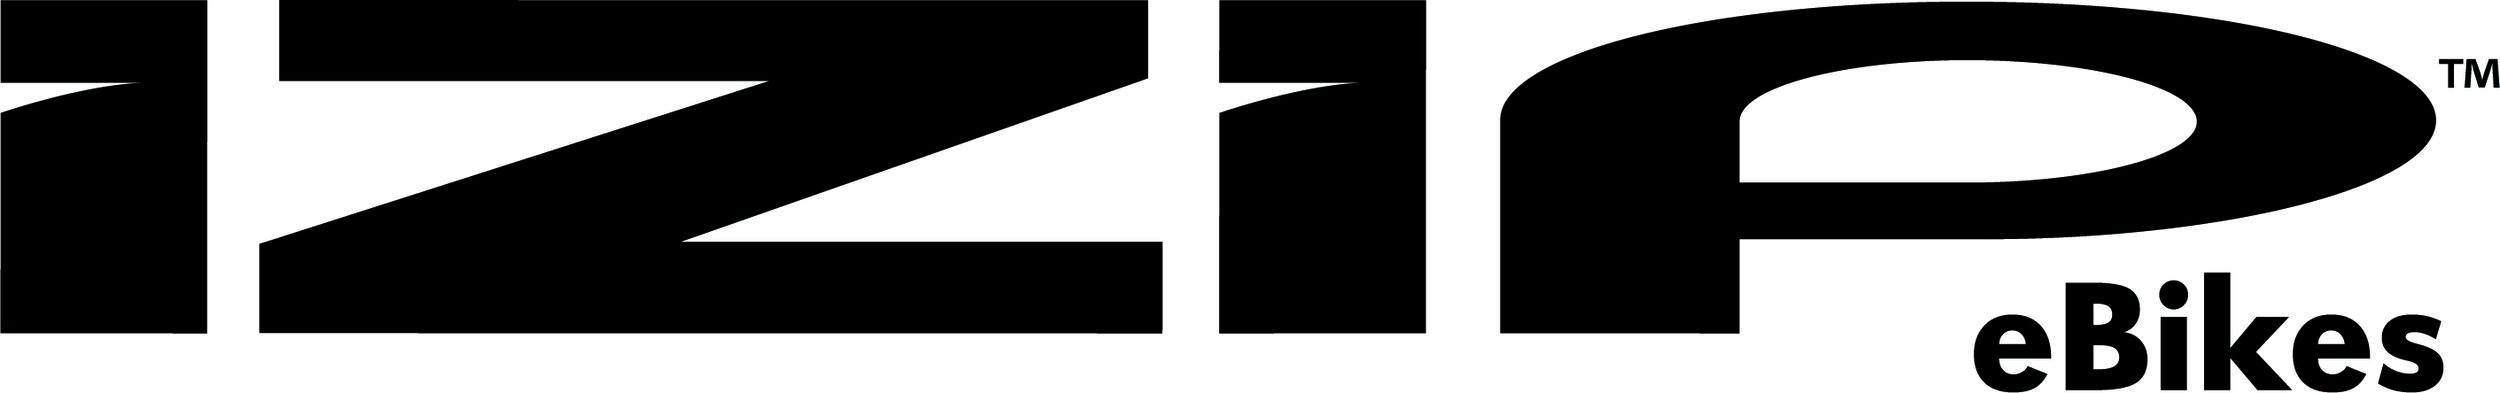 iZip-LogoLowRes.jpg